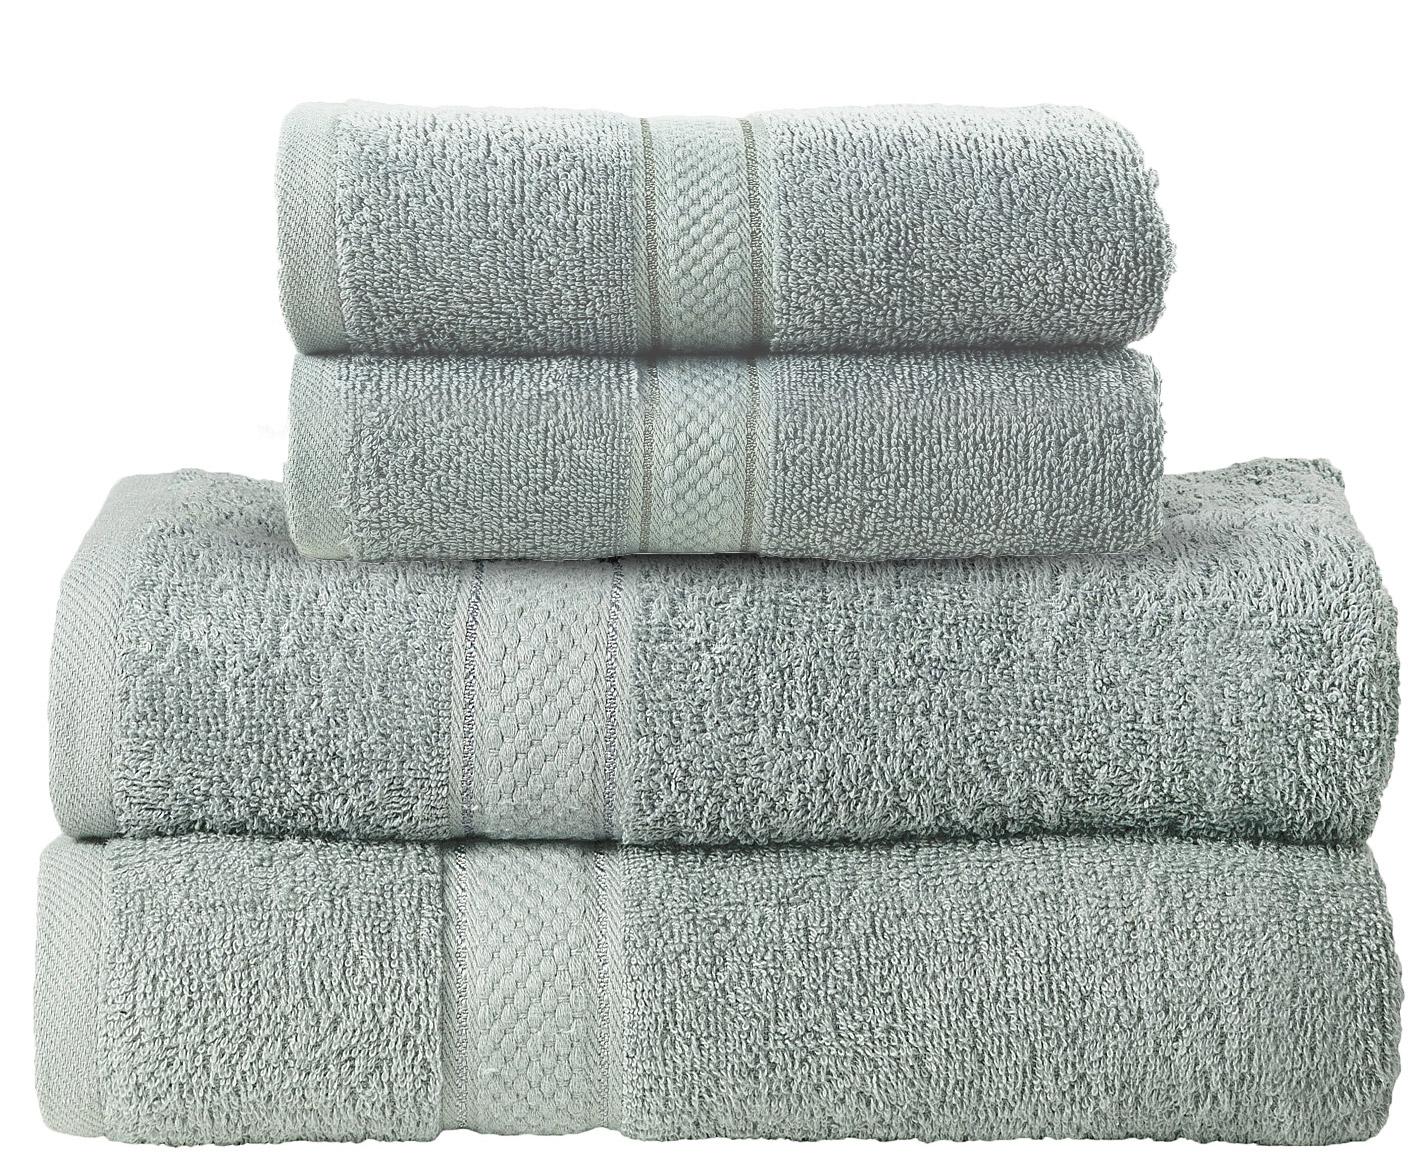 Bale Set 4pcs Silver Plain 2x Hand Towel & Bath